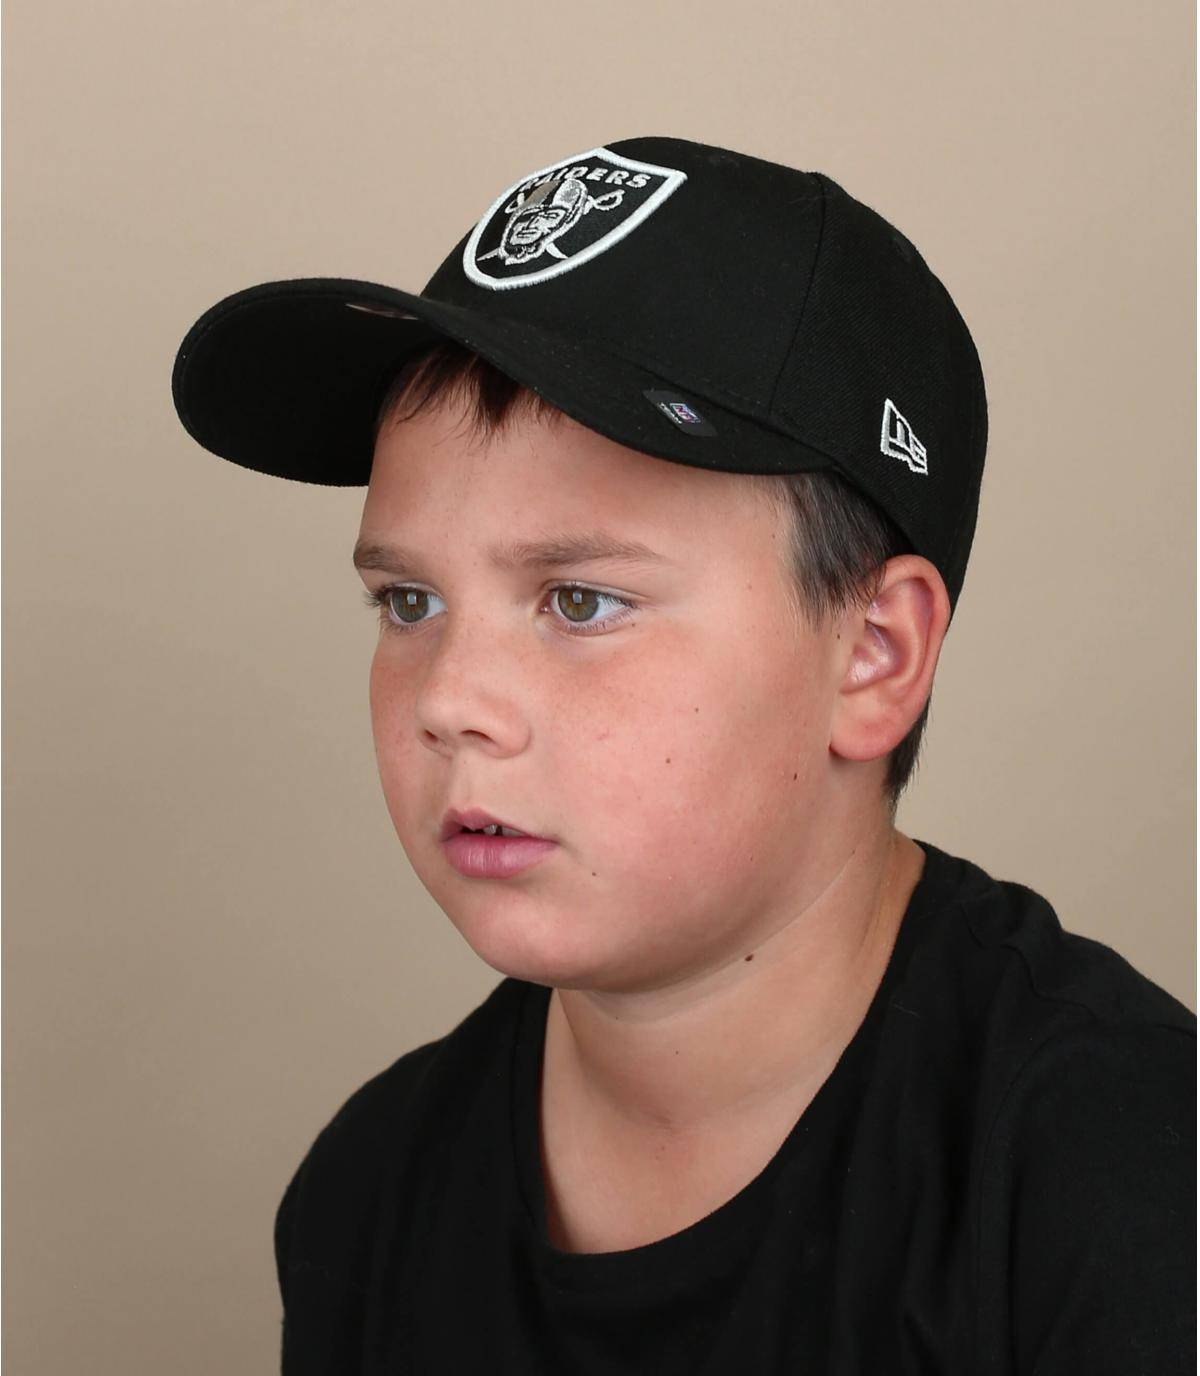 kids Raiders cap